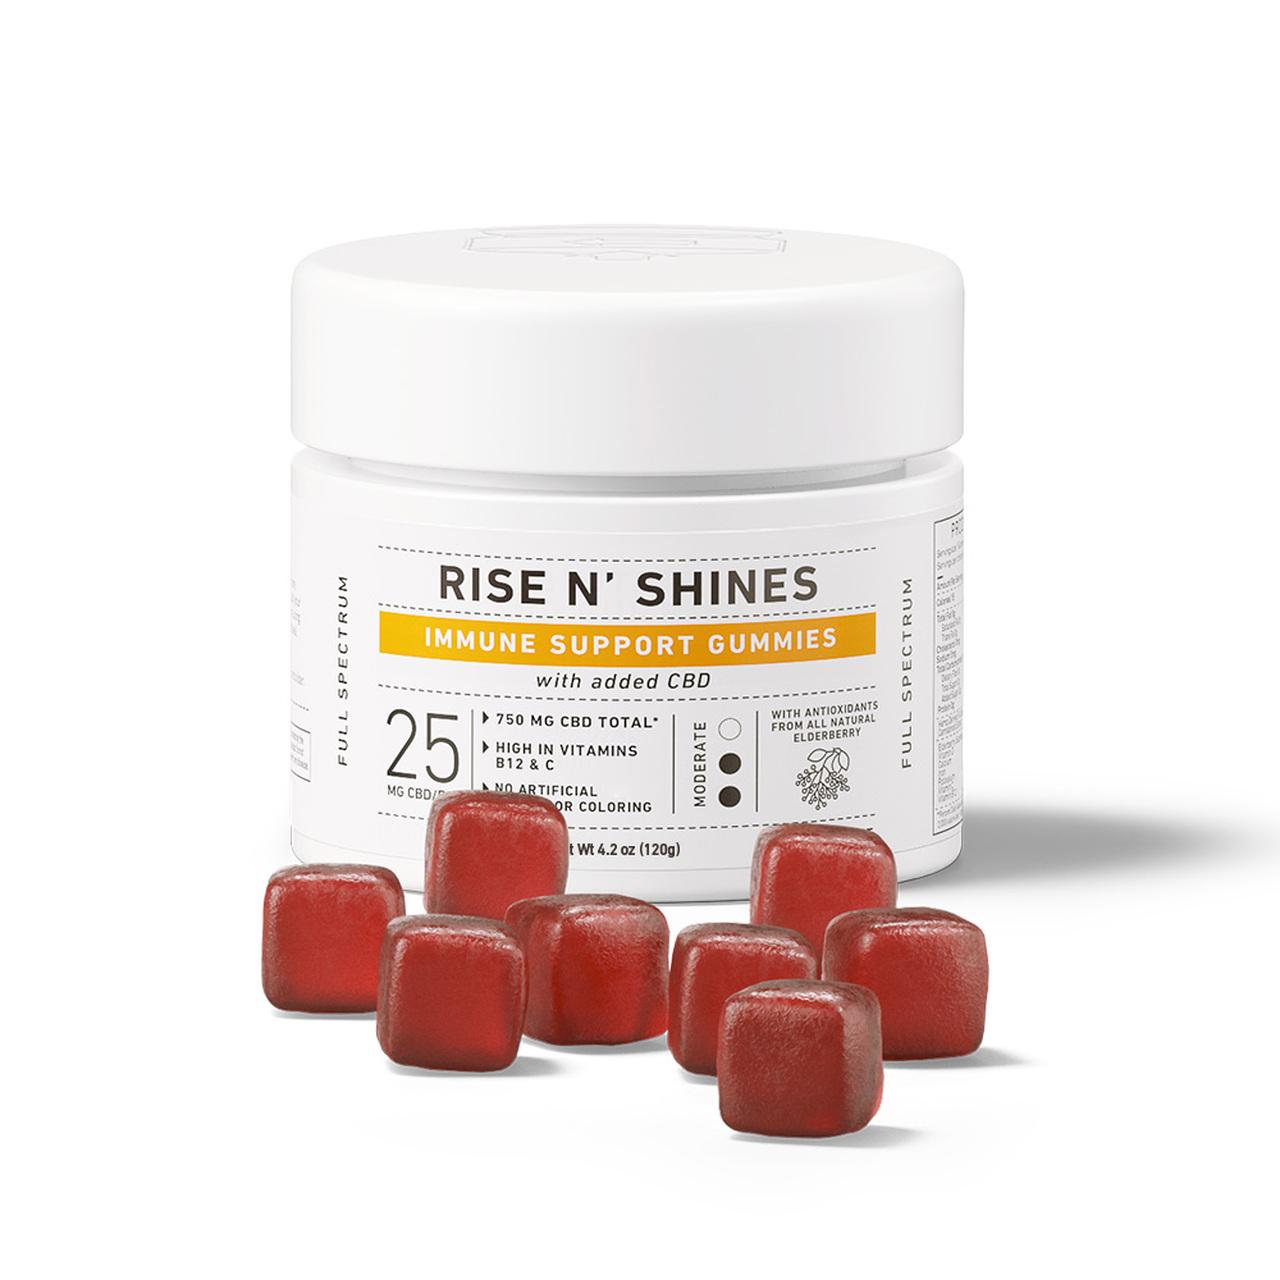 Green Roads, Rise N' Shines Immune Support CBD Gummies, Full Spectrum, 30ct, 750mg CBD 2